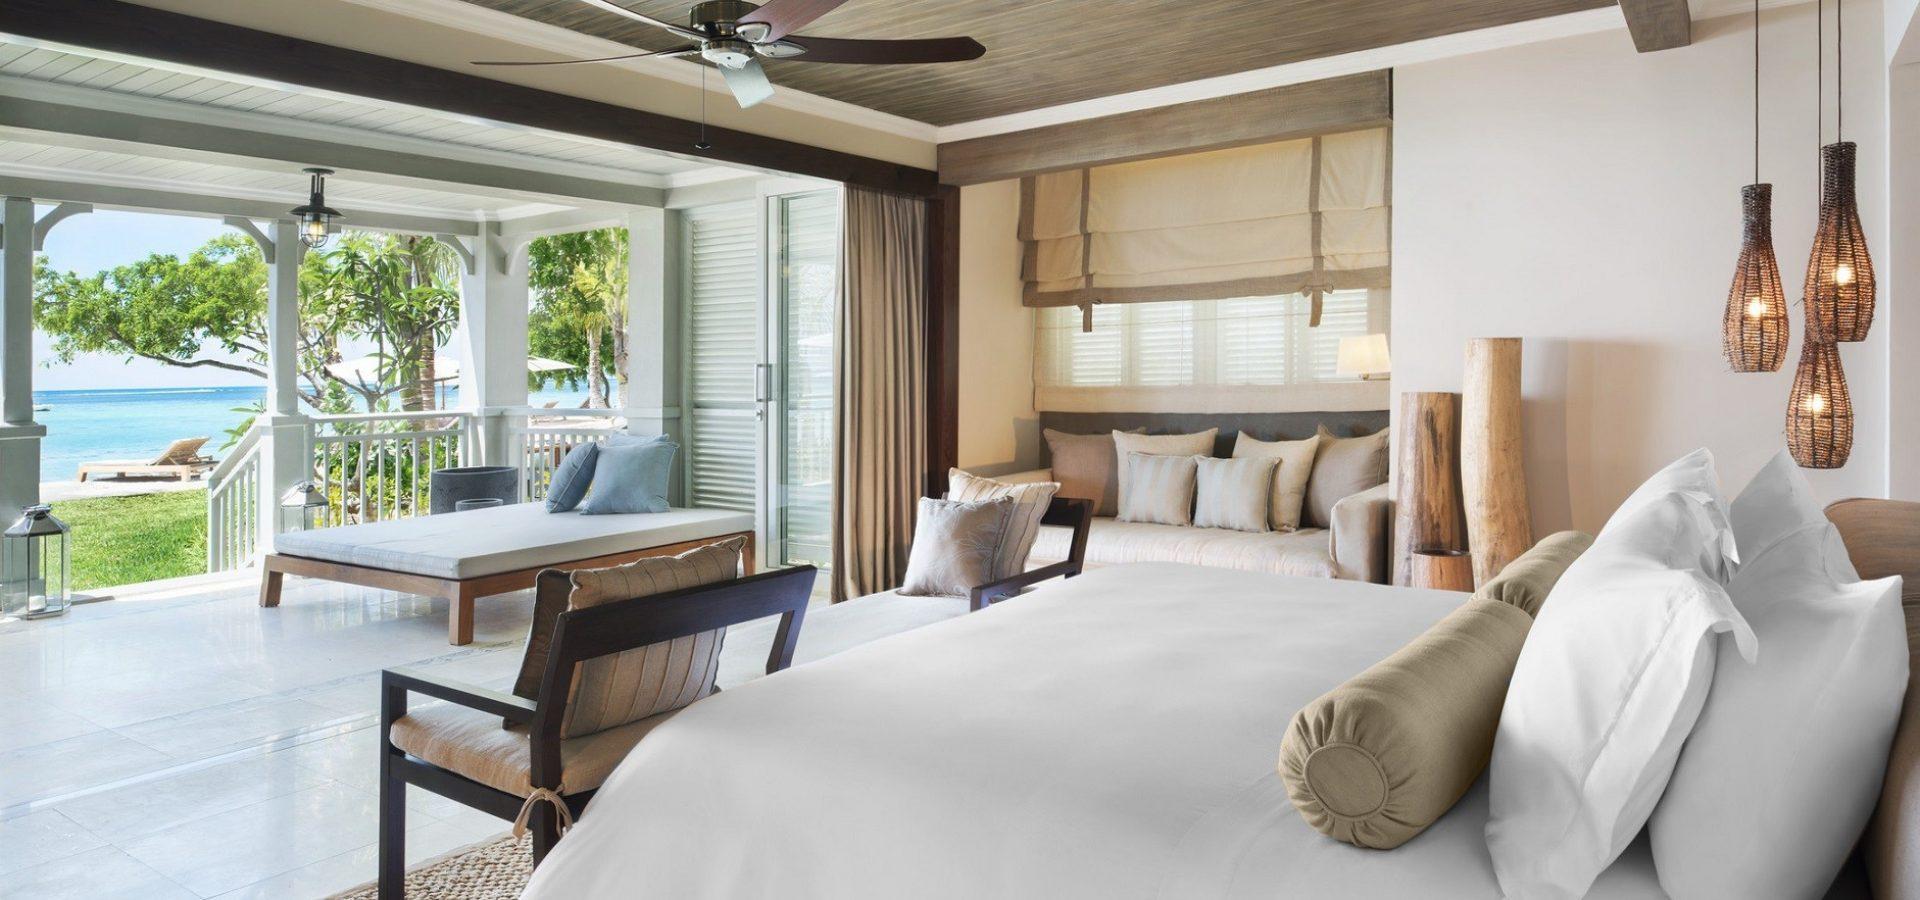 the-st-regis-mauritius-resort-6-906d220e-9b9c-4790-8630-f156013f83e4